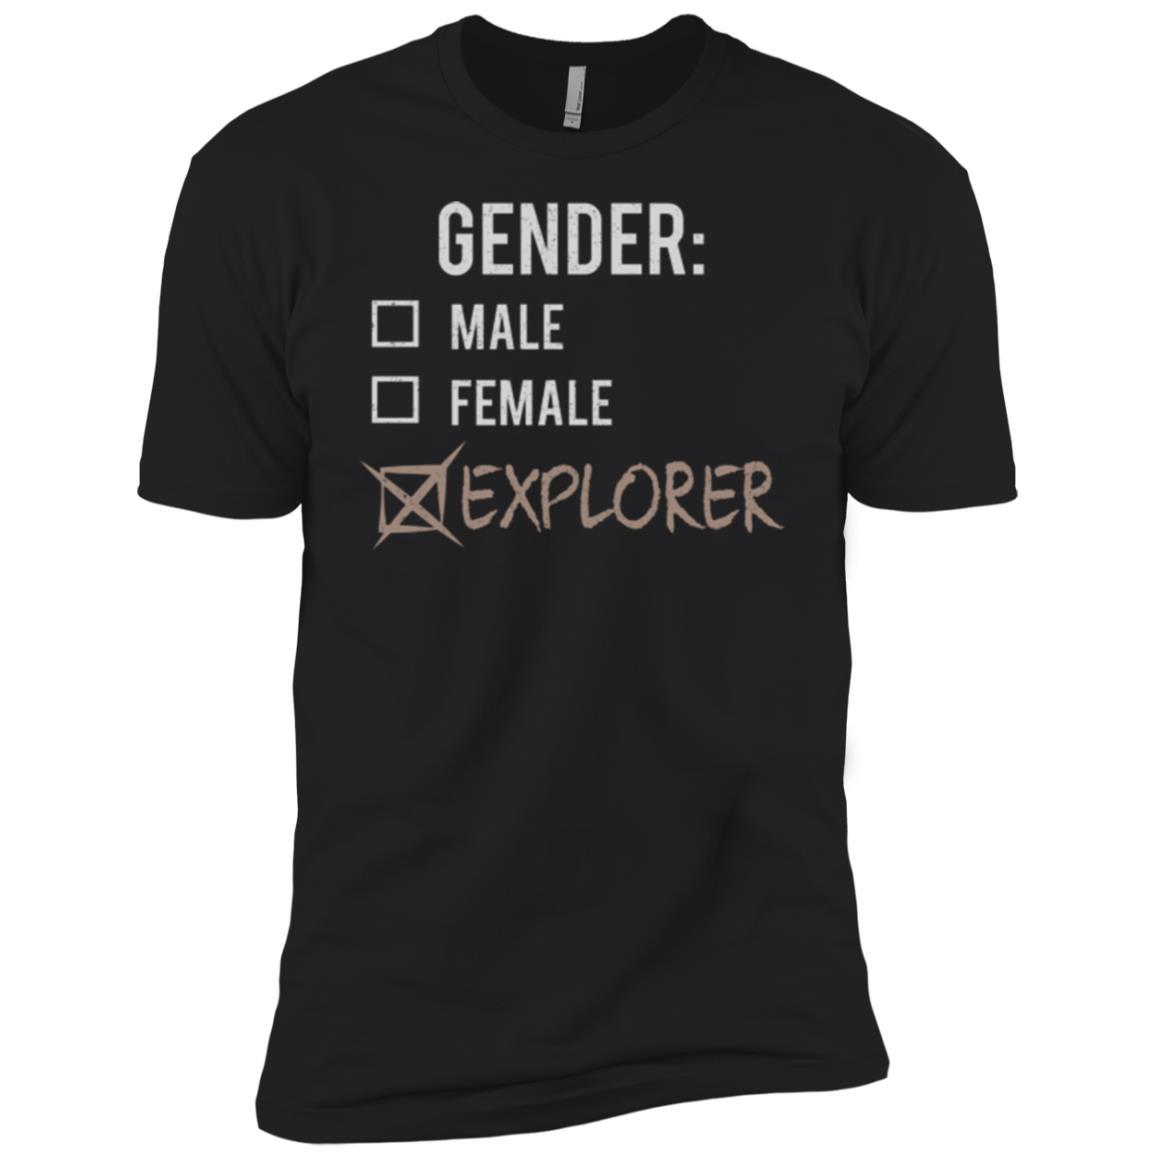 Male Female Explorer Gender Nonbinary Trans Men Short Sleeve T-Shirt